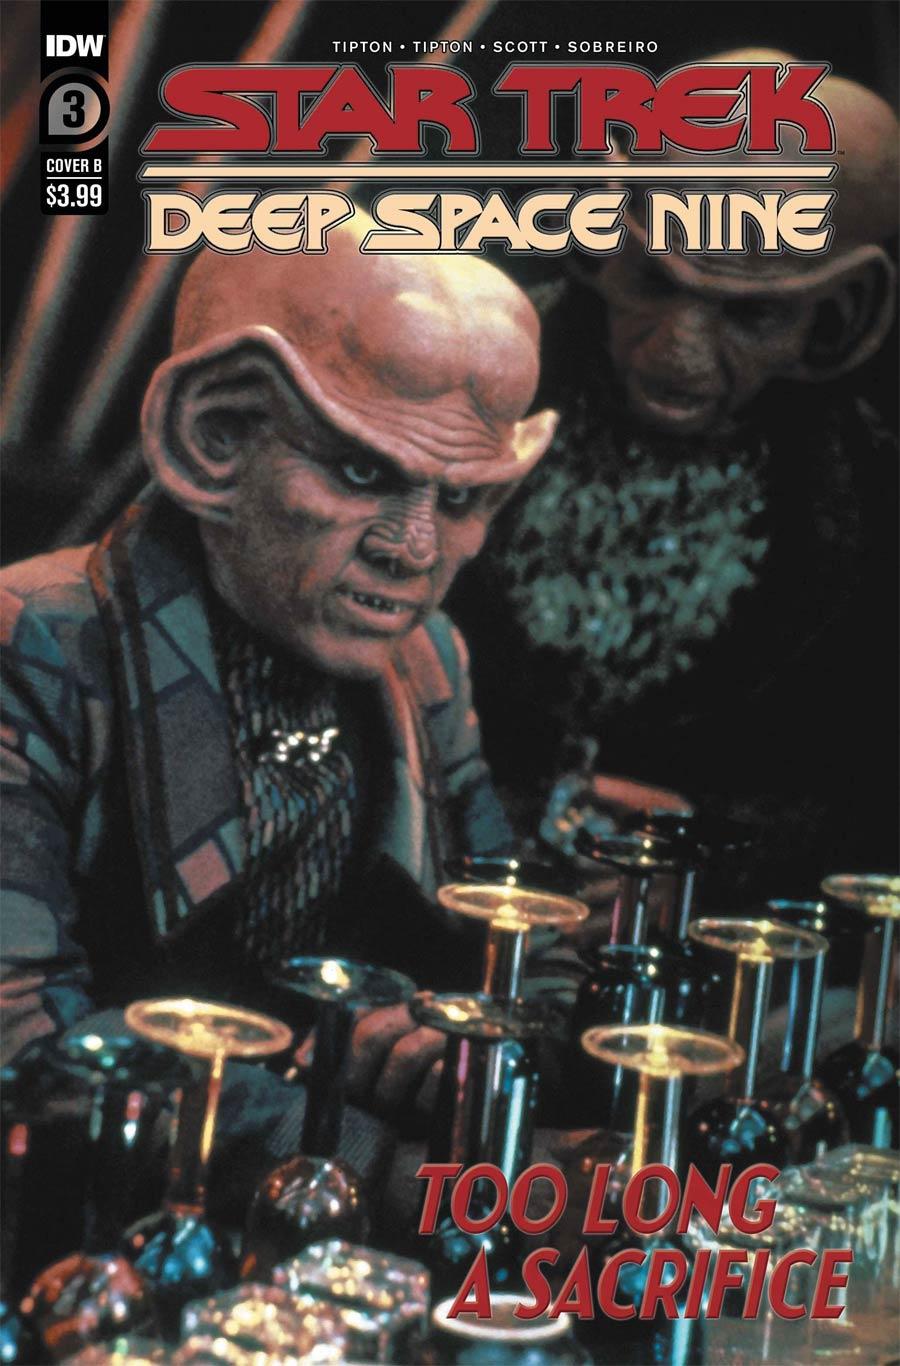 Star Trek Deep Space Nine Too Long A Sacrifice #3 Cover B Variant Photo Cover